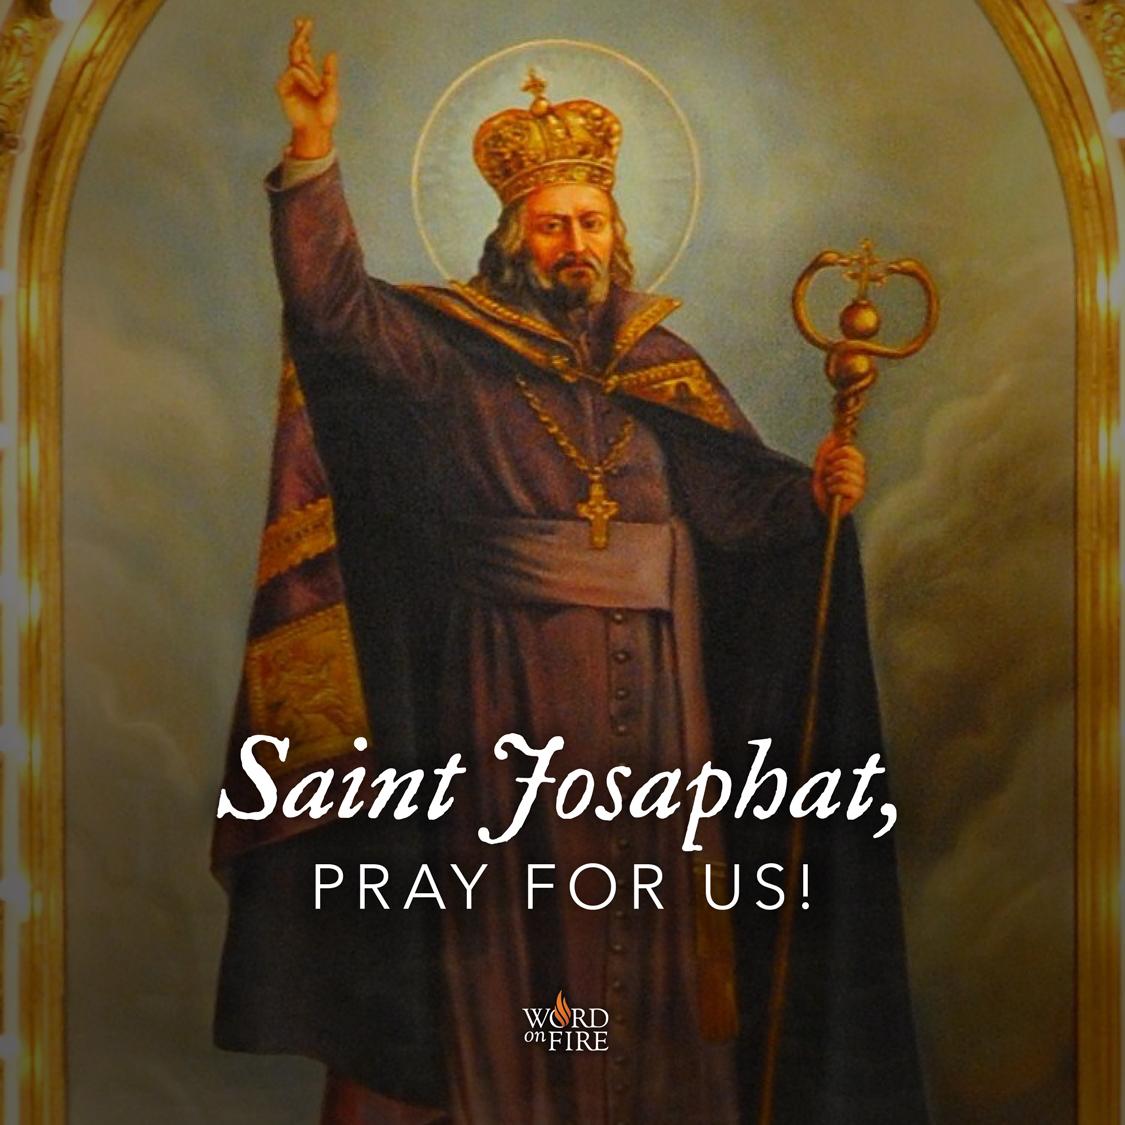 Prayergraphics Com 187 St Josaphat Pray For Us